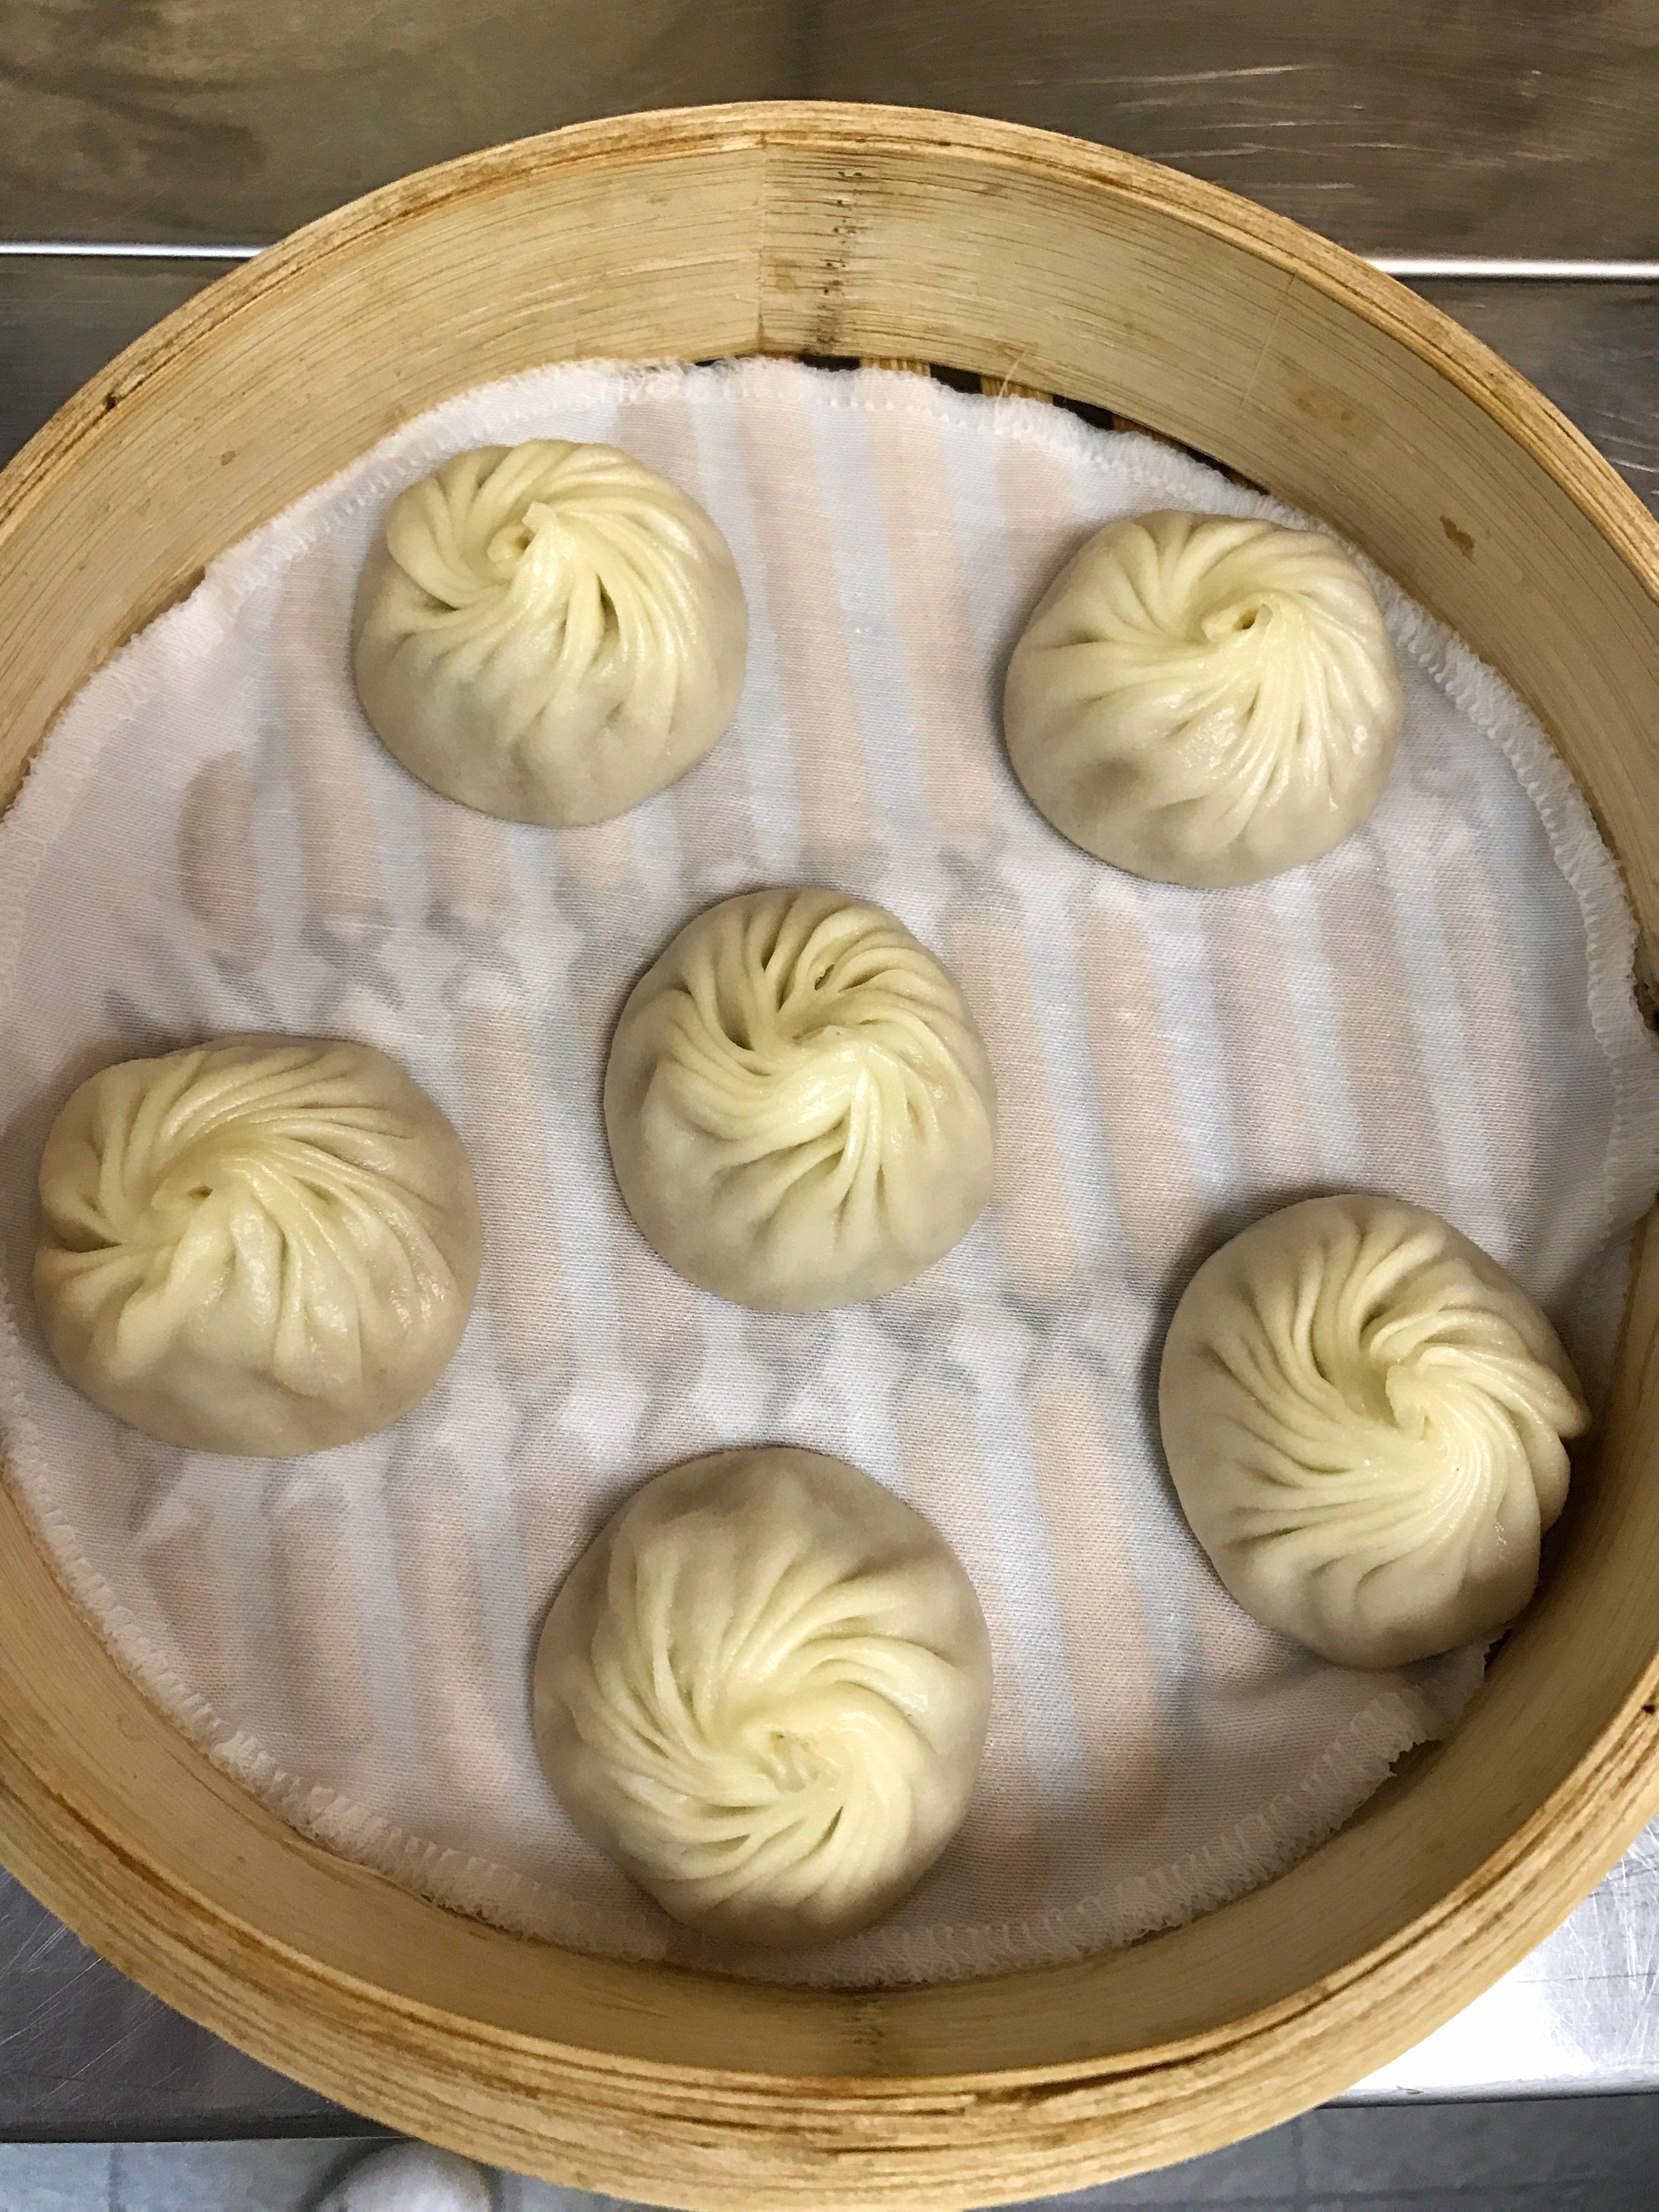 One order of Din Tai Fung's xiaolongbao.